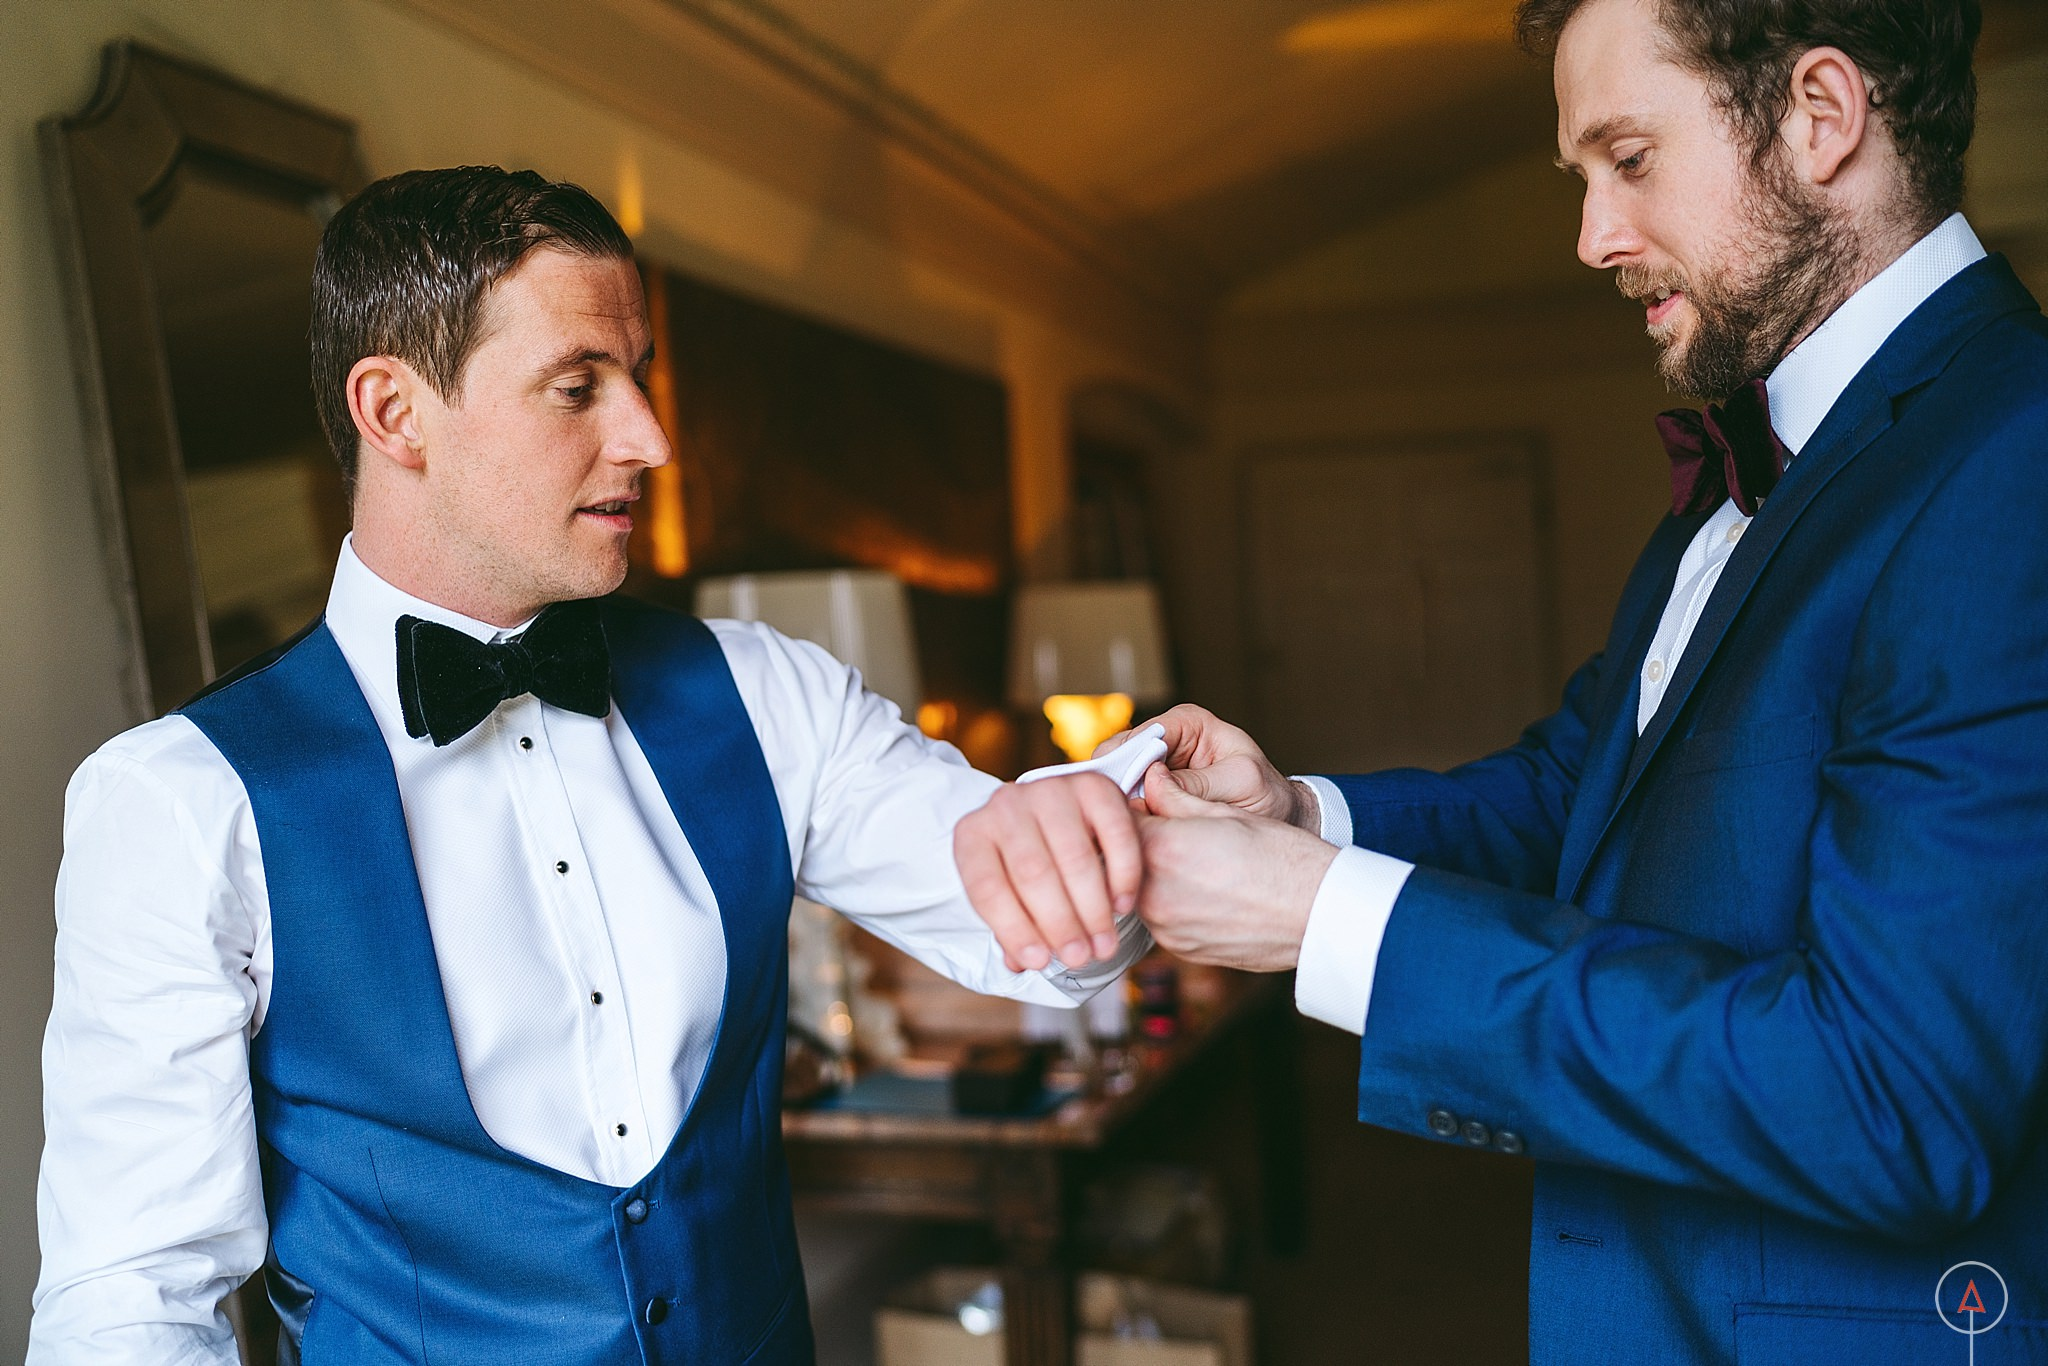 cardiff-wedding-photographer-aga-tomaszek_0233